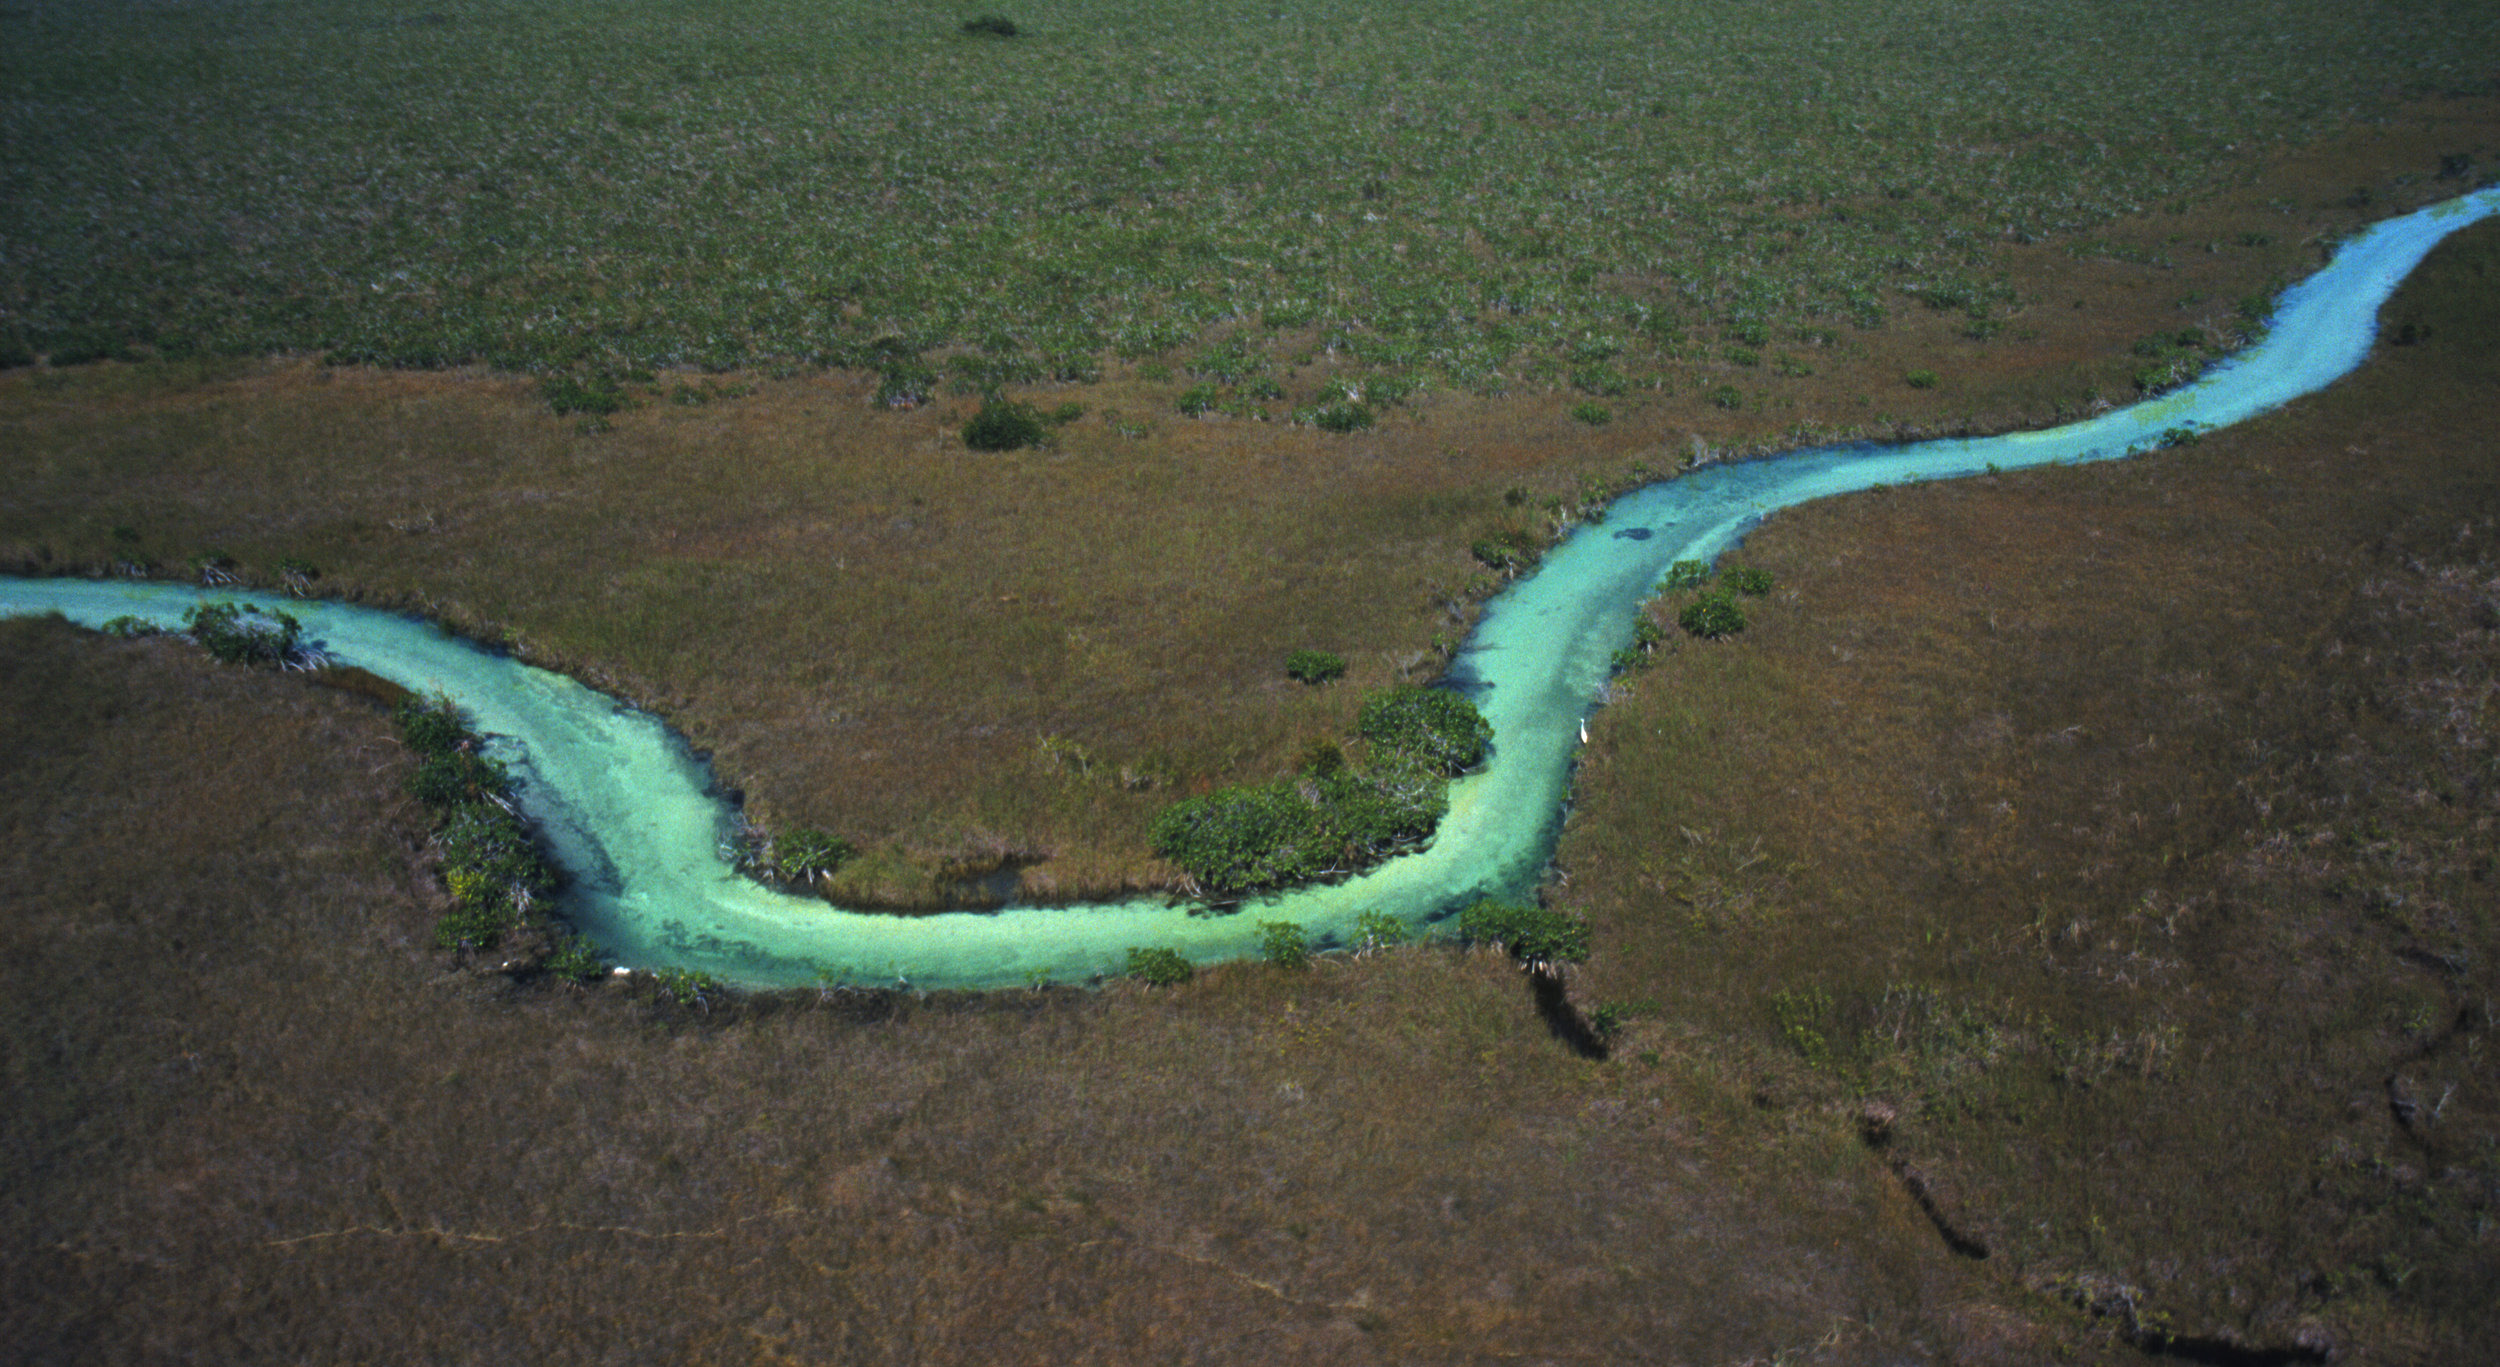 Mexico's Sian Ka'an Biosphere Reserve  photo: ©2003 Sam Meacham